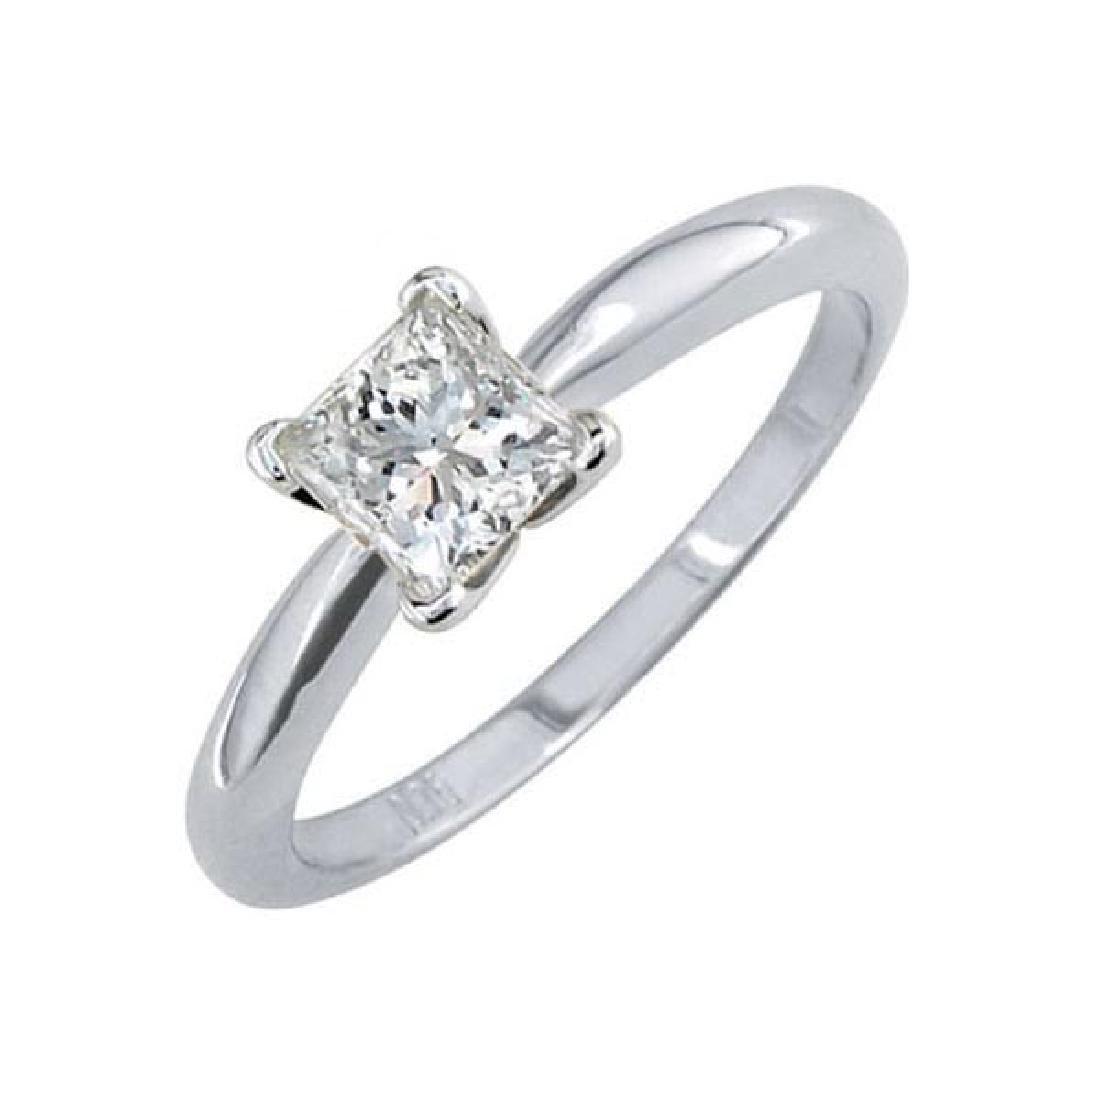 Certified 1 CTW Princess Diamond Solitaire 14k Ring D/S